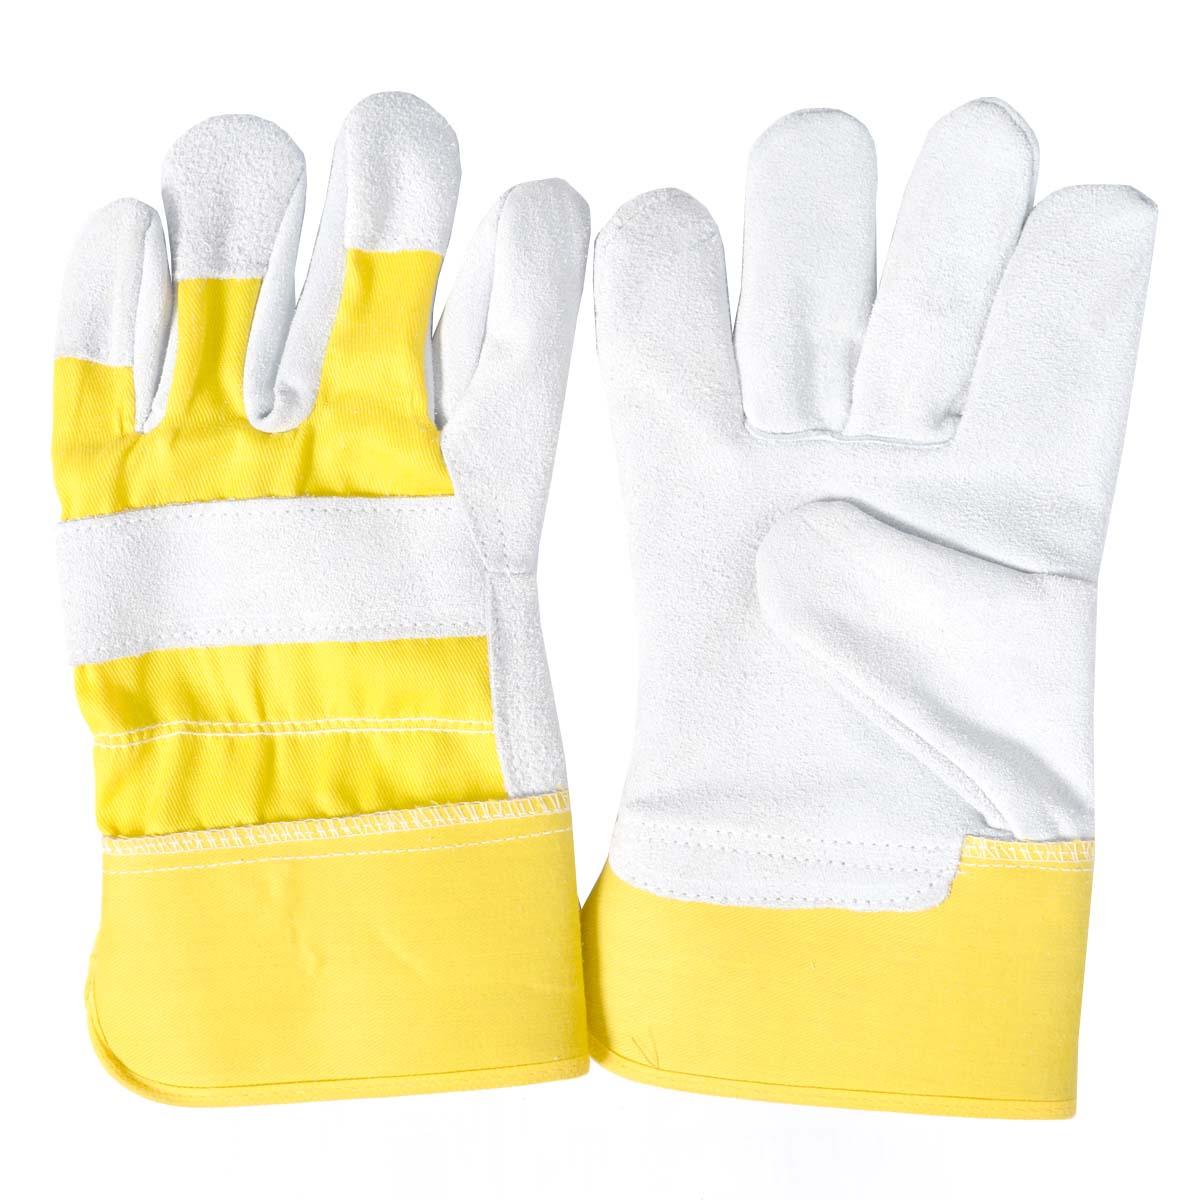 Split Leather Work Gloves